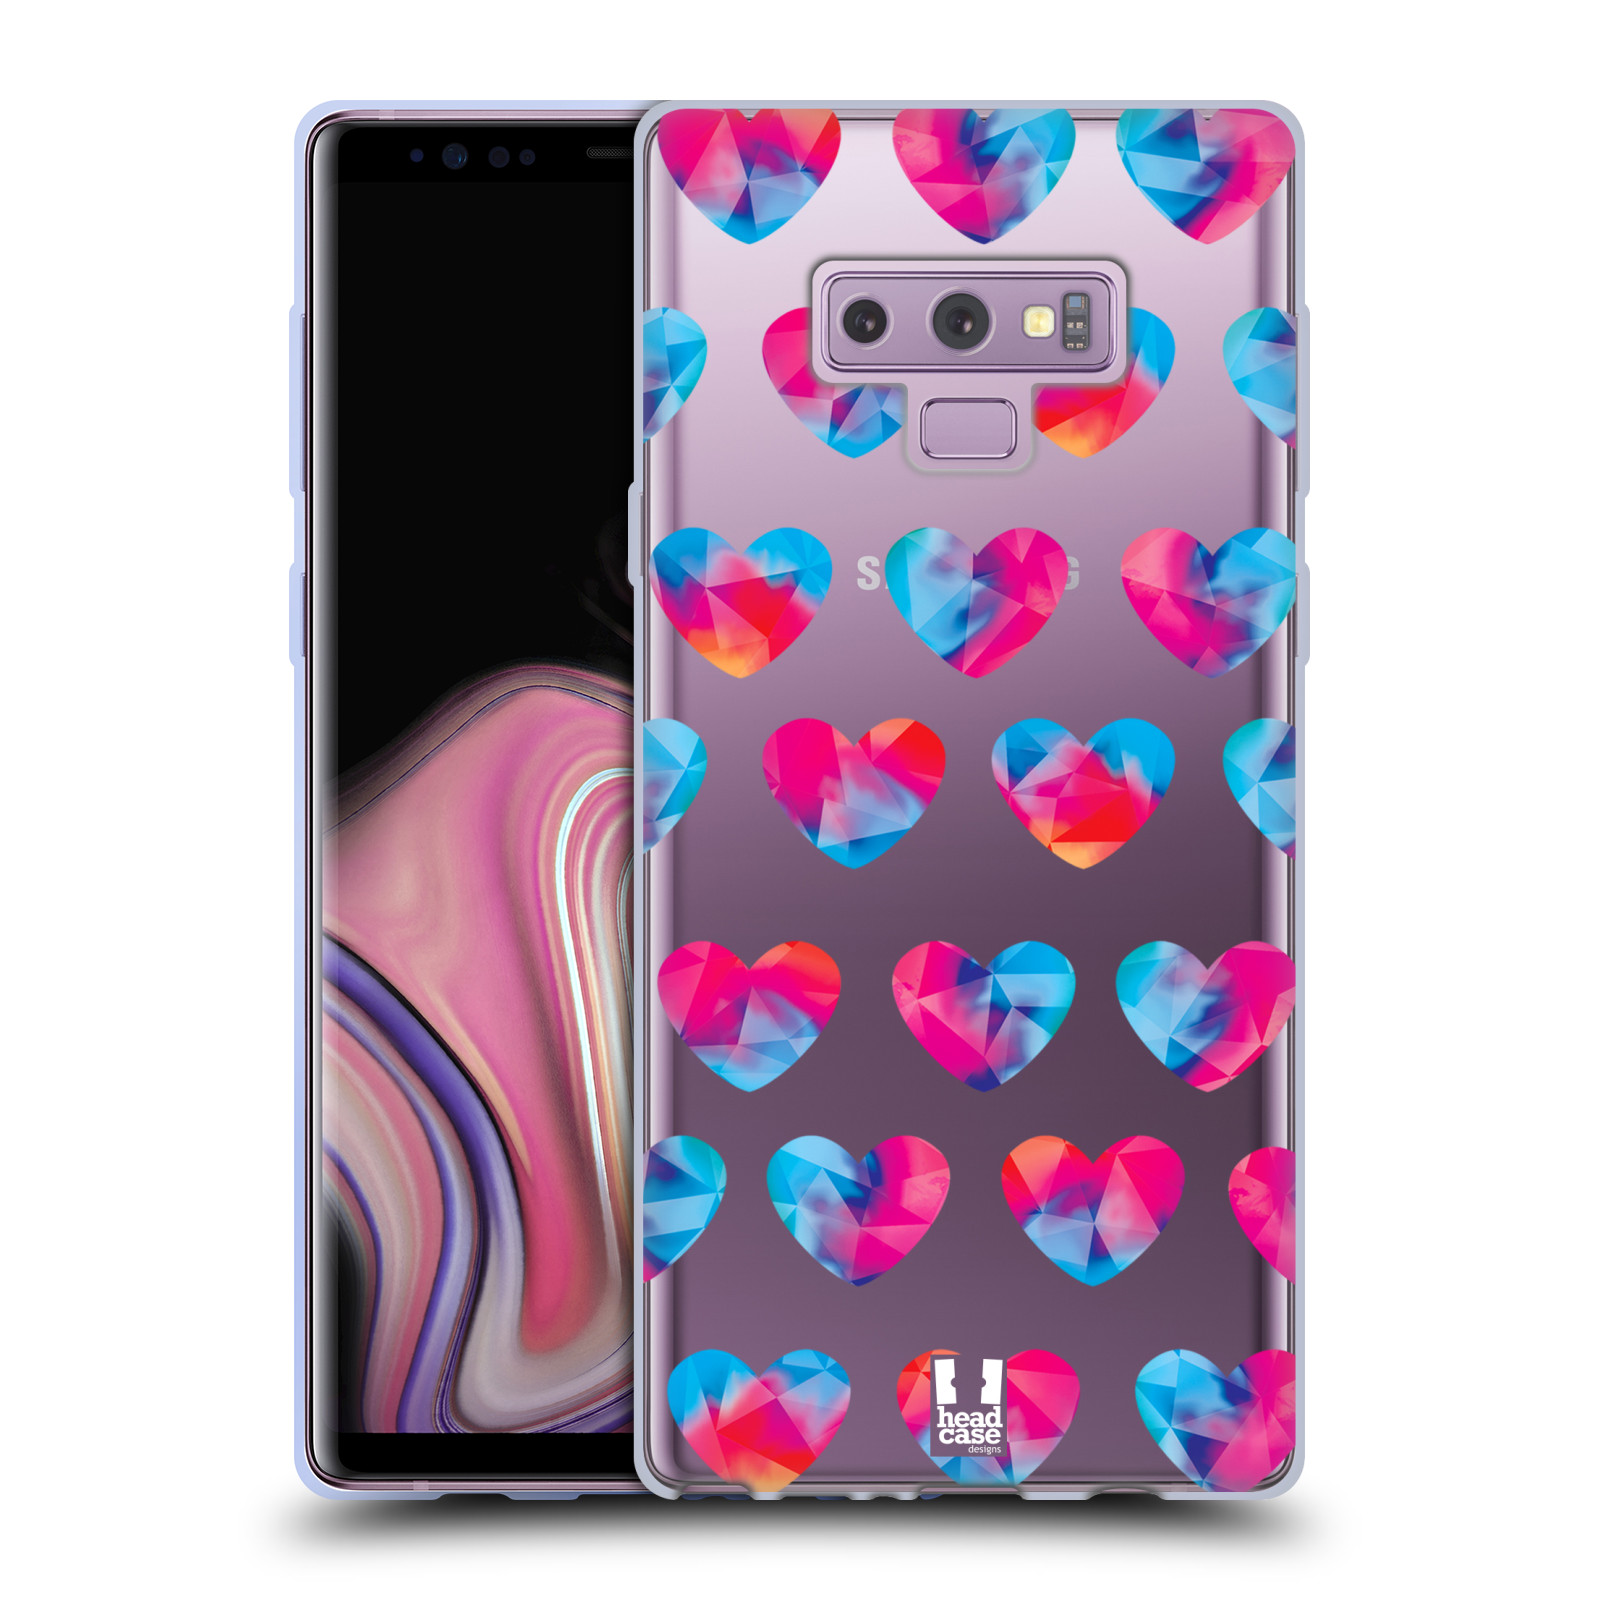 Silikonové pouzdro na mobil Samsung Galaxy Note 9 - Head Case - Srdíčka hrající barvami